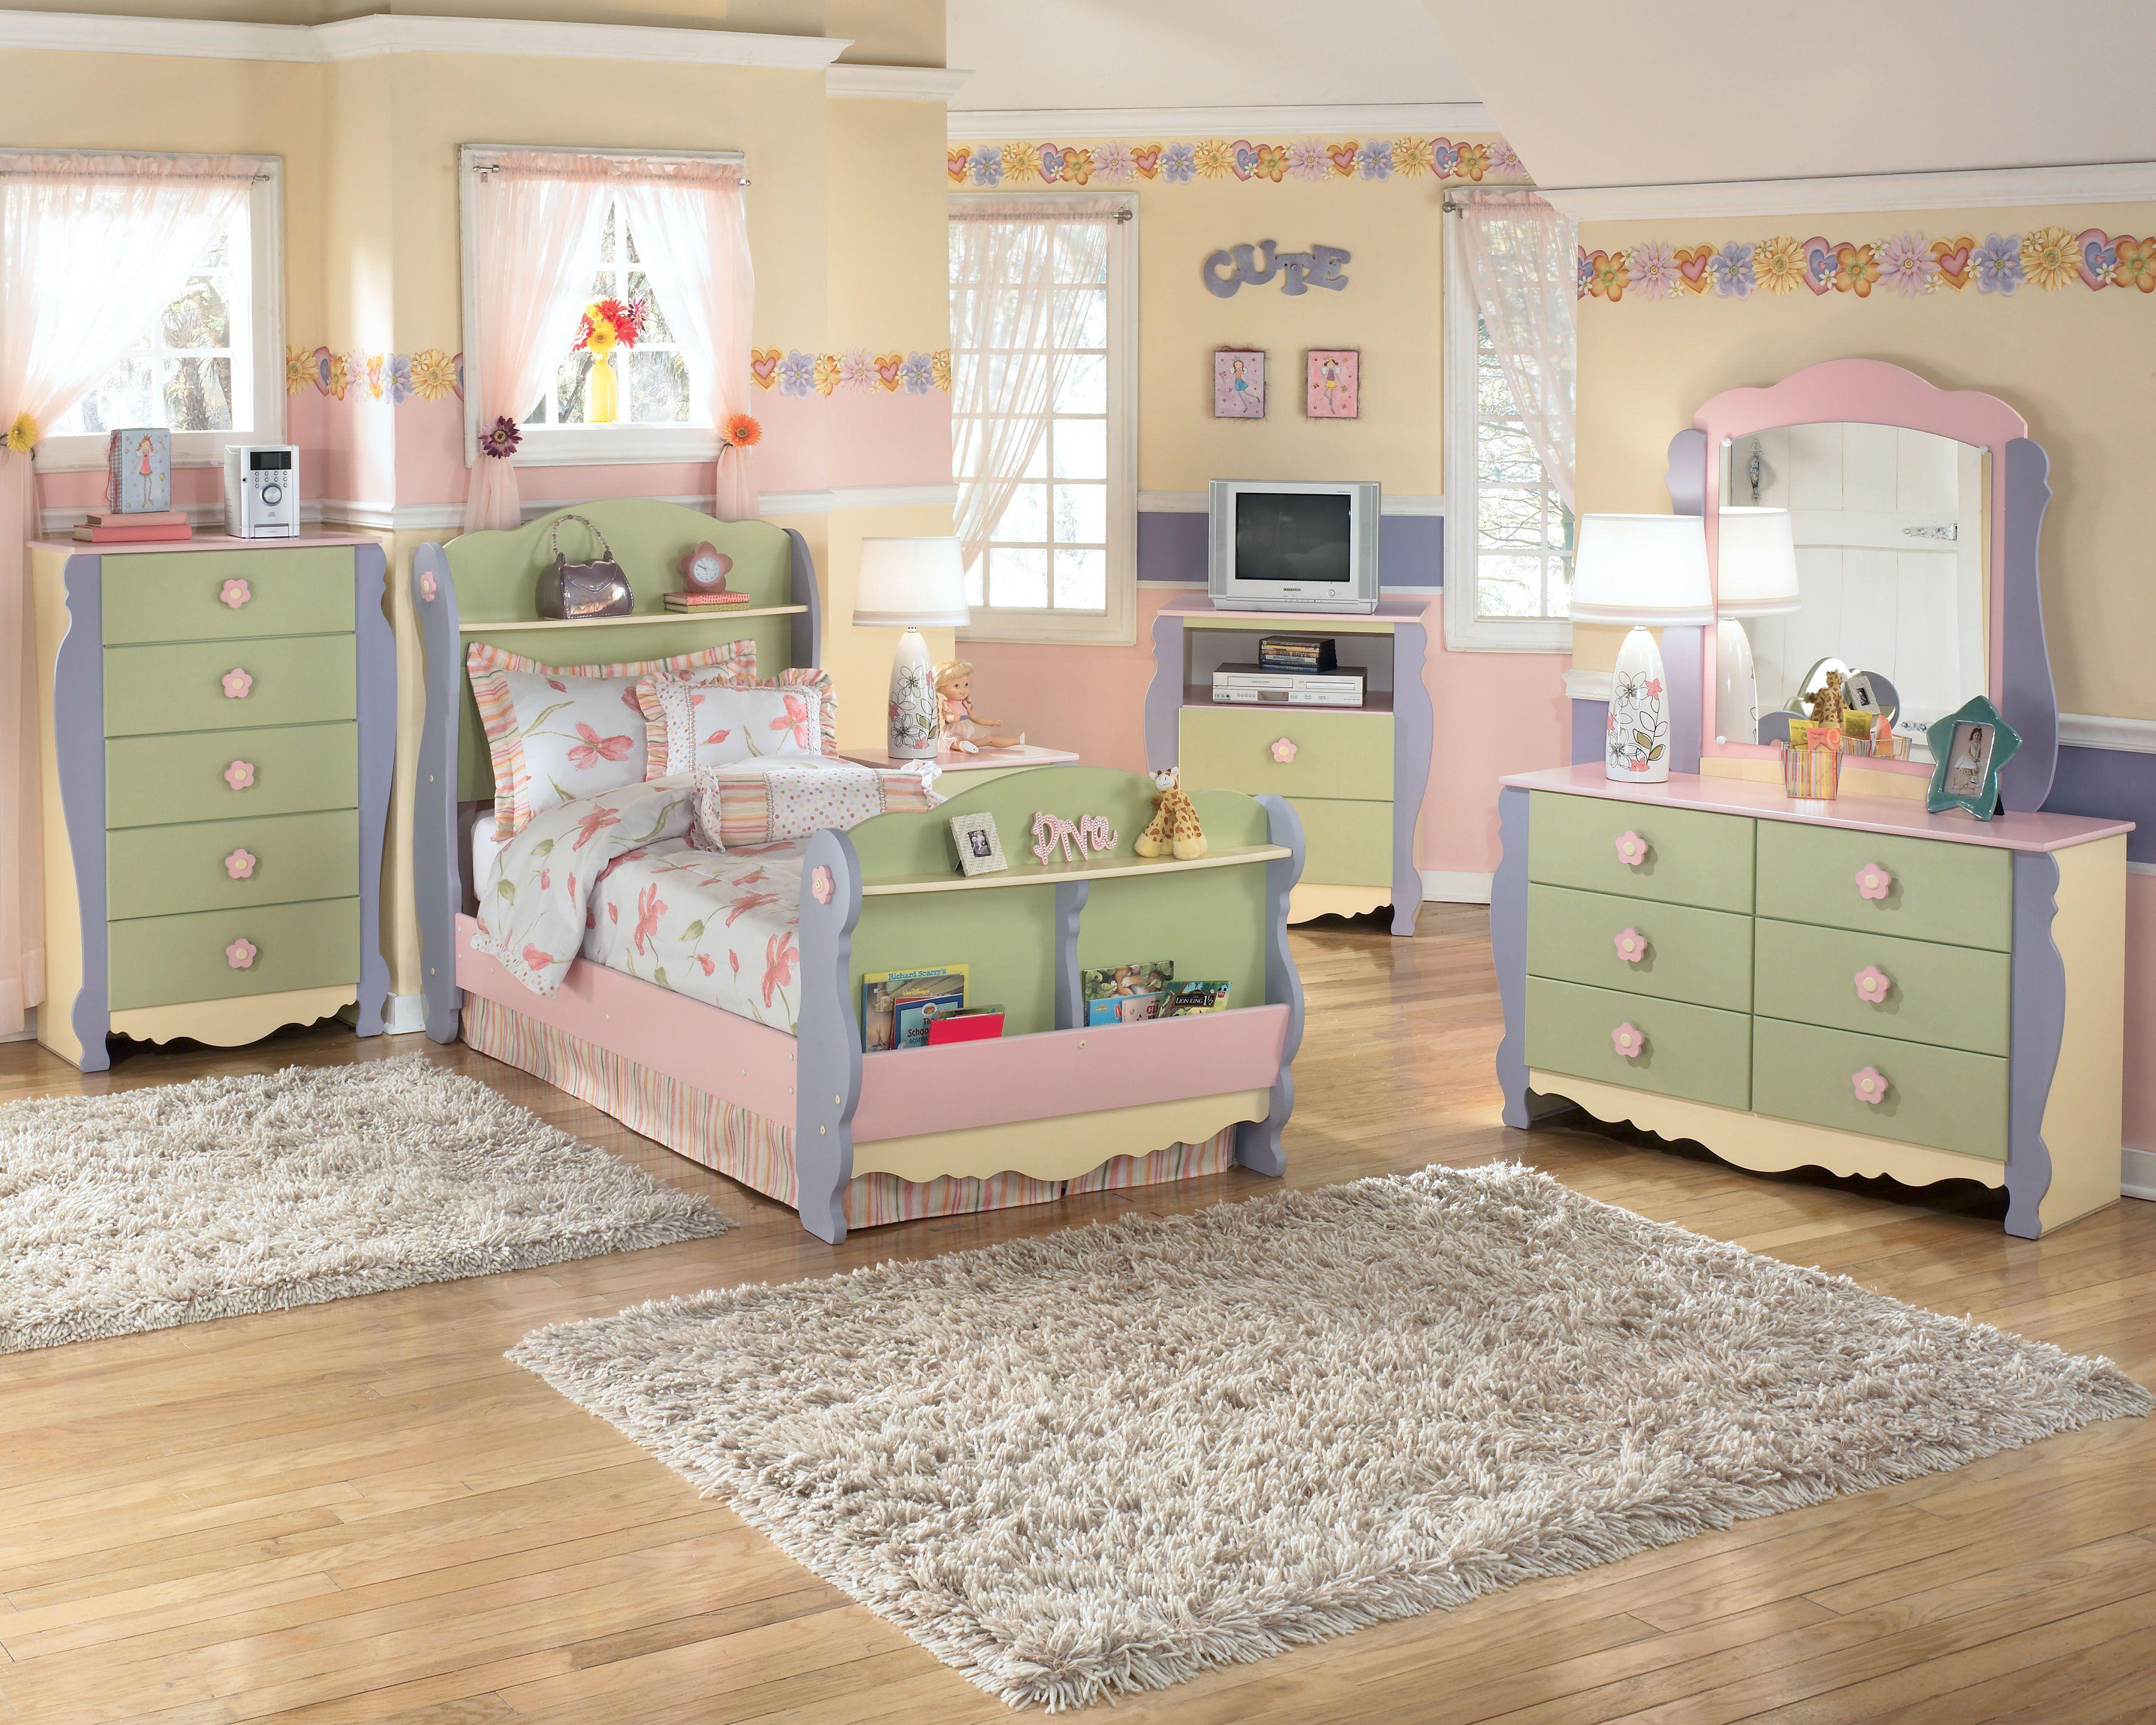 Sweet Ashley Furniture Homestore #bedroom Little Girl. Excited